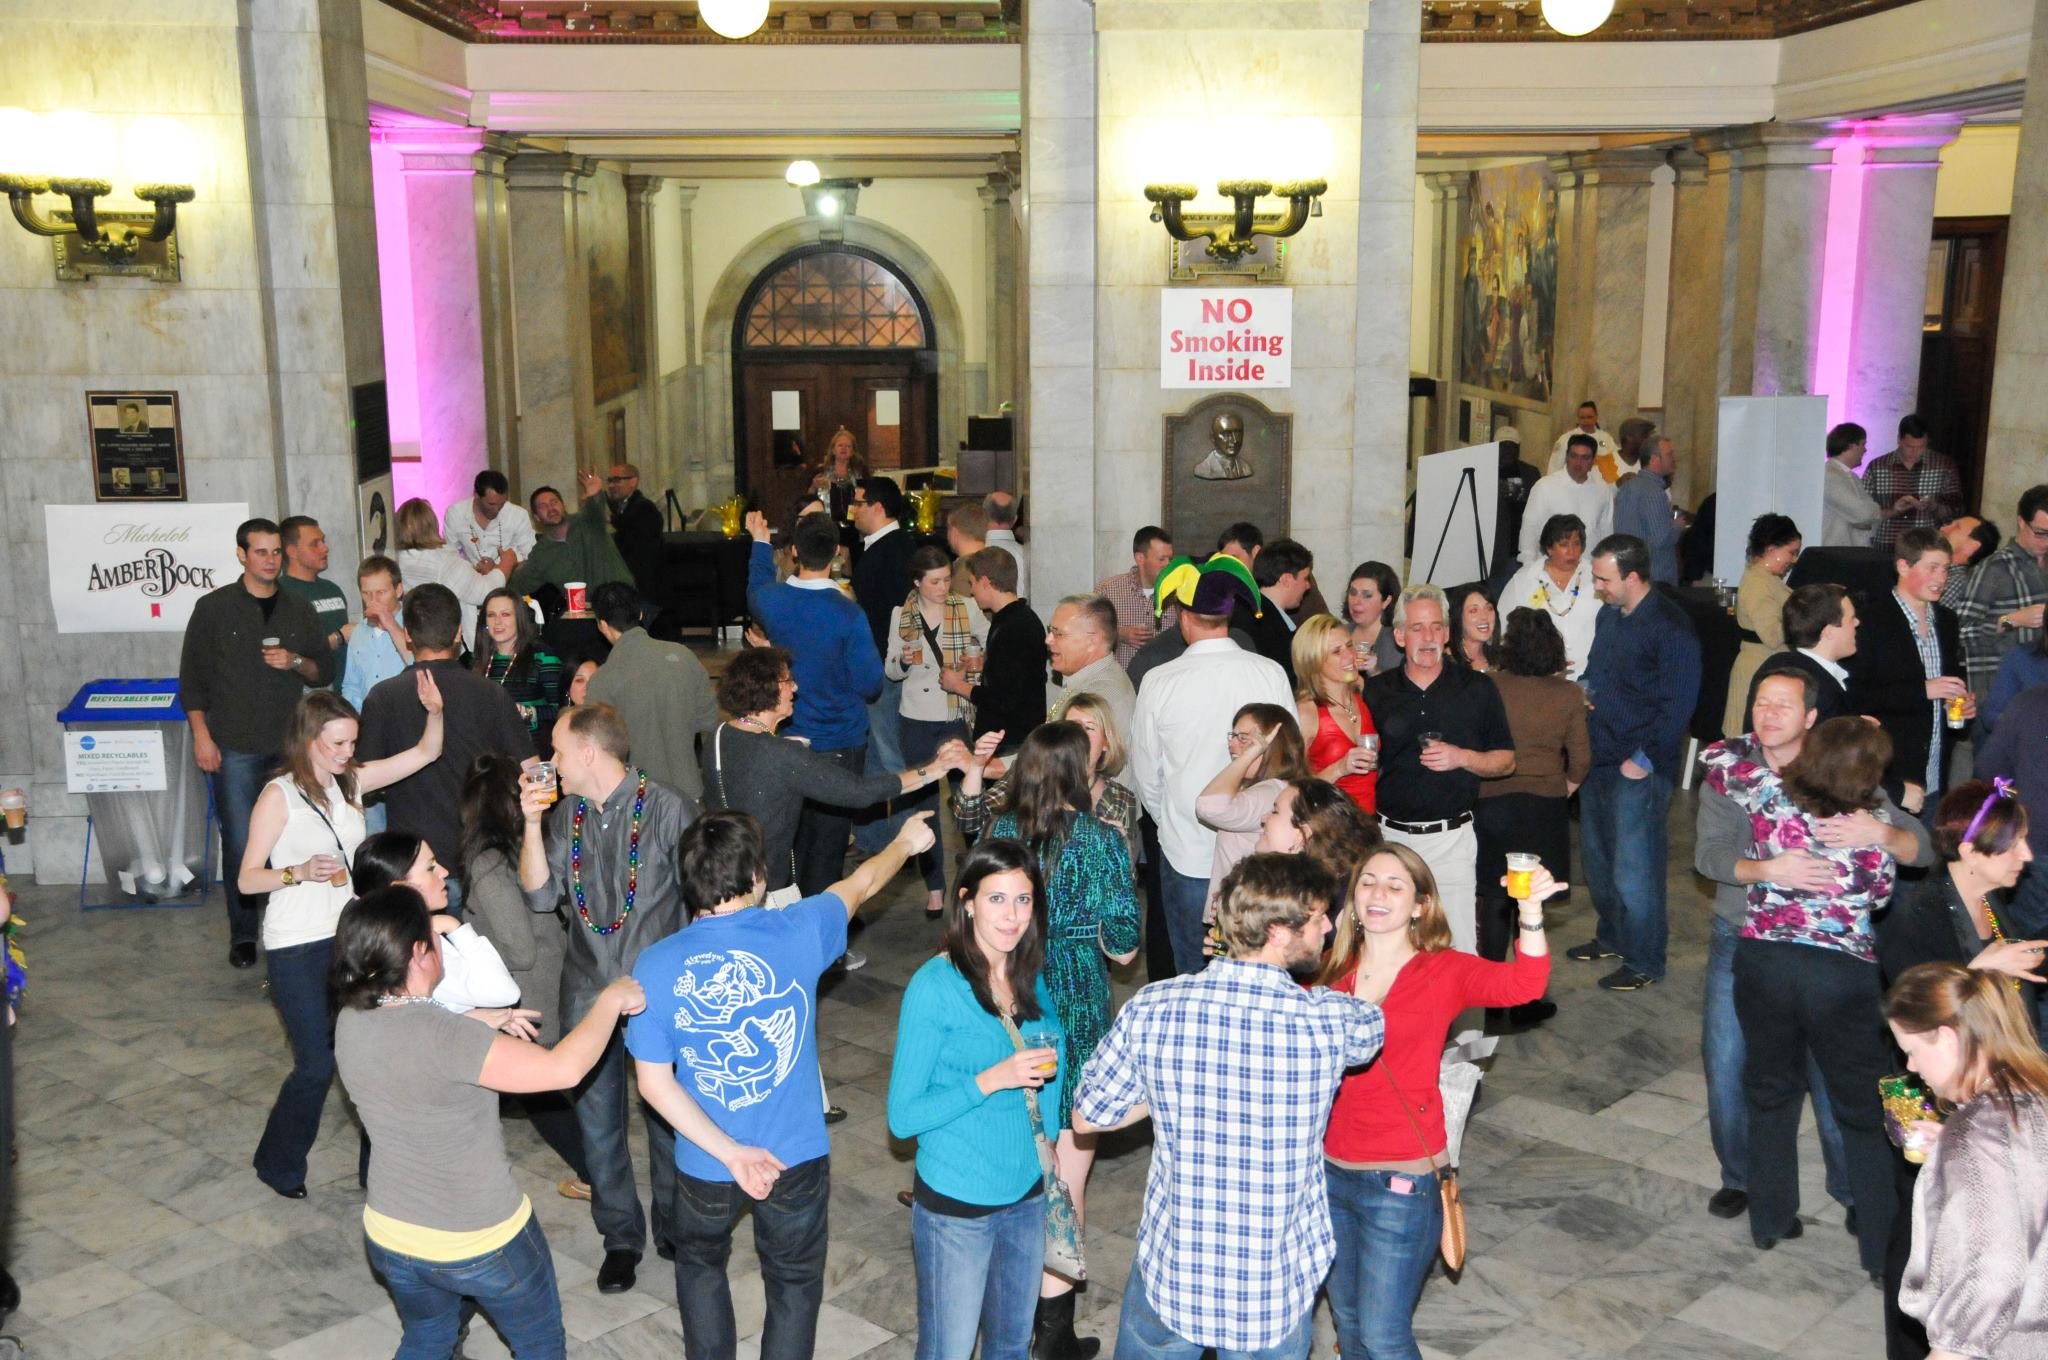 Mardi Gras Takes Over City Hall